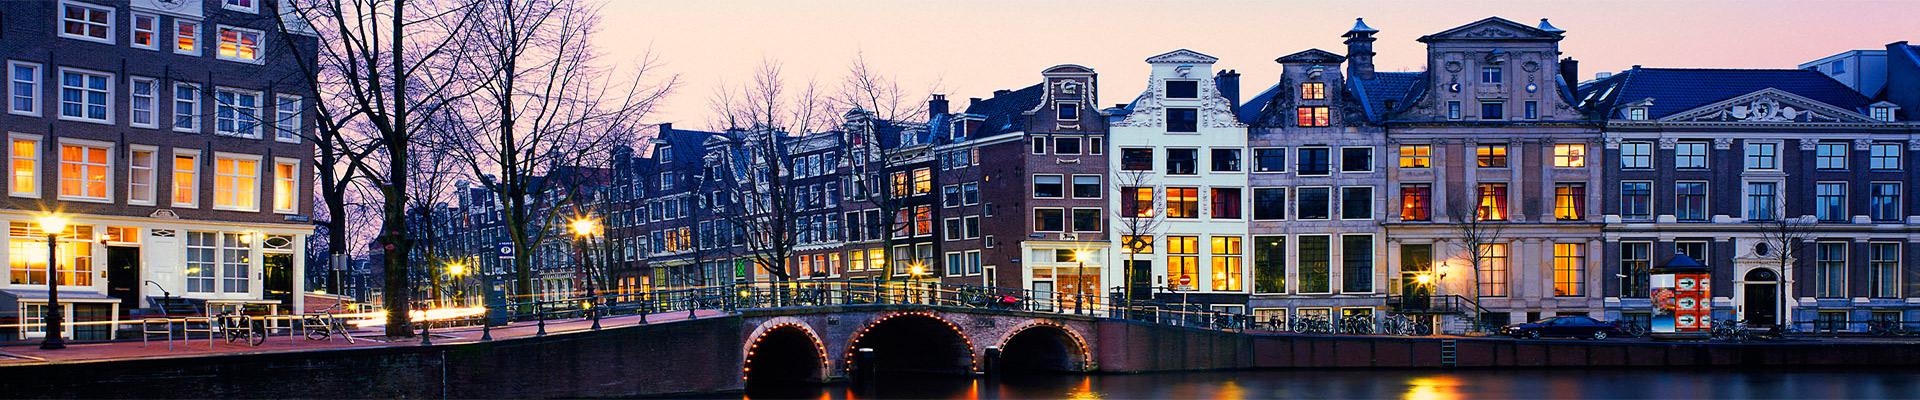 Grupo para Amsterdam e Países Baixos